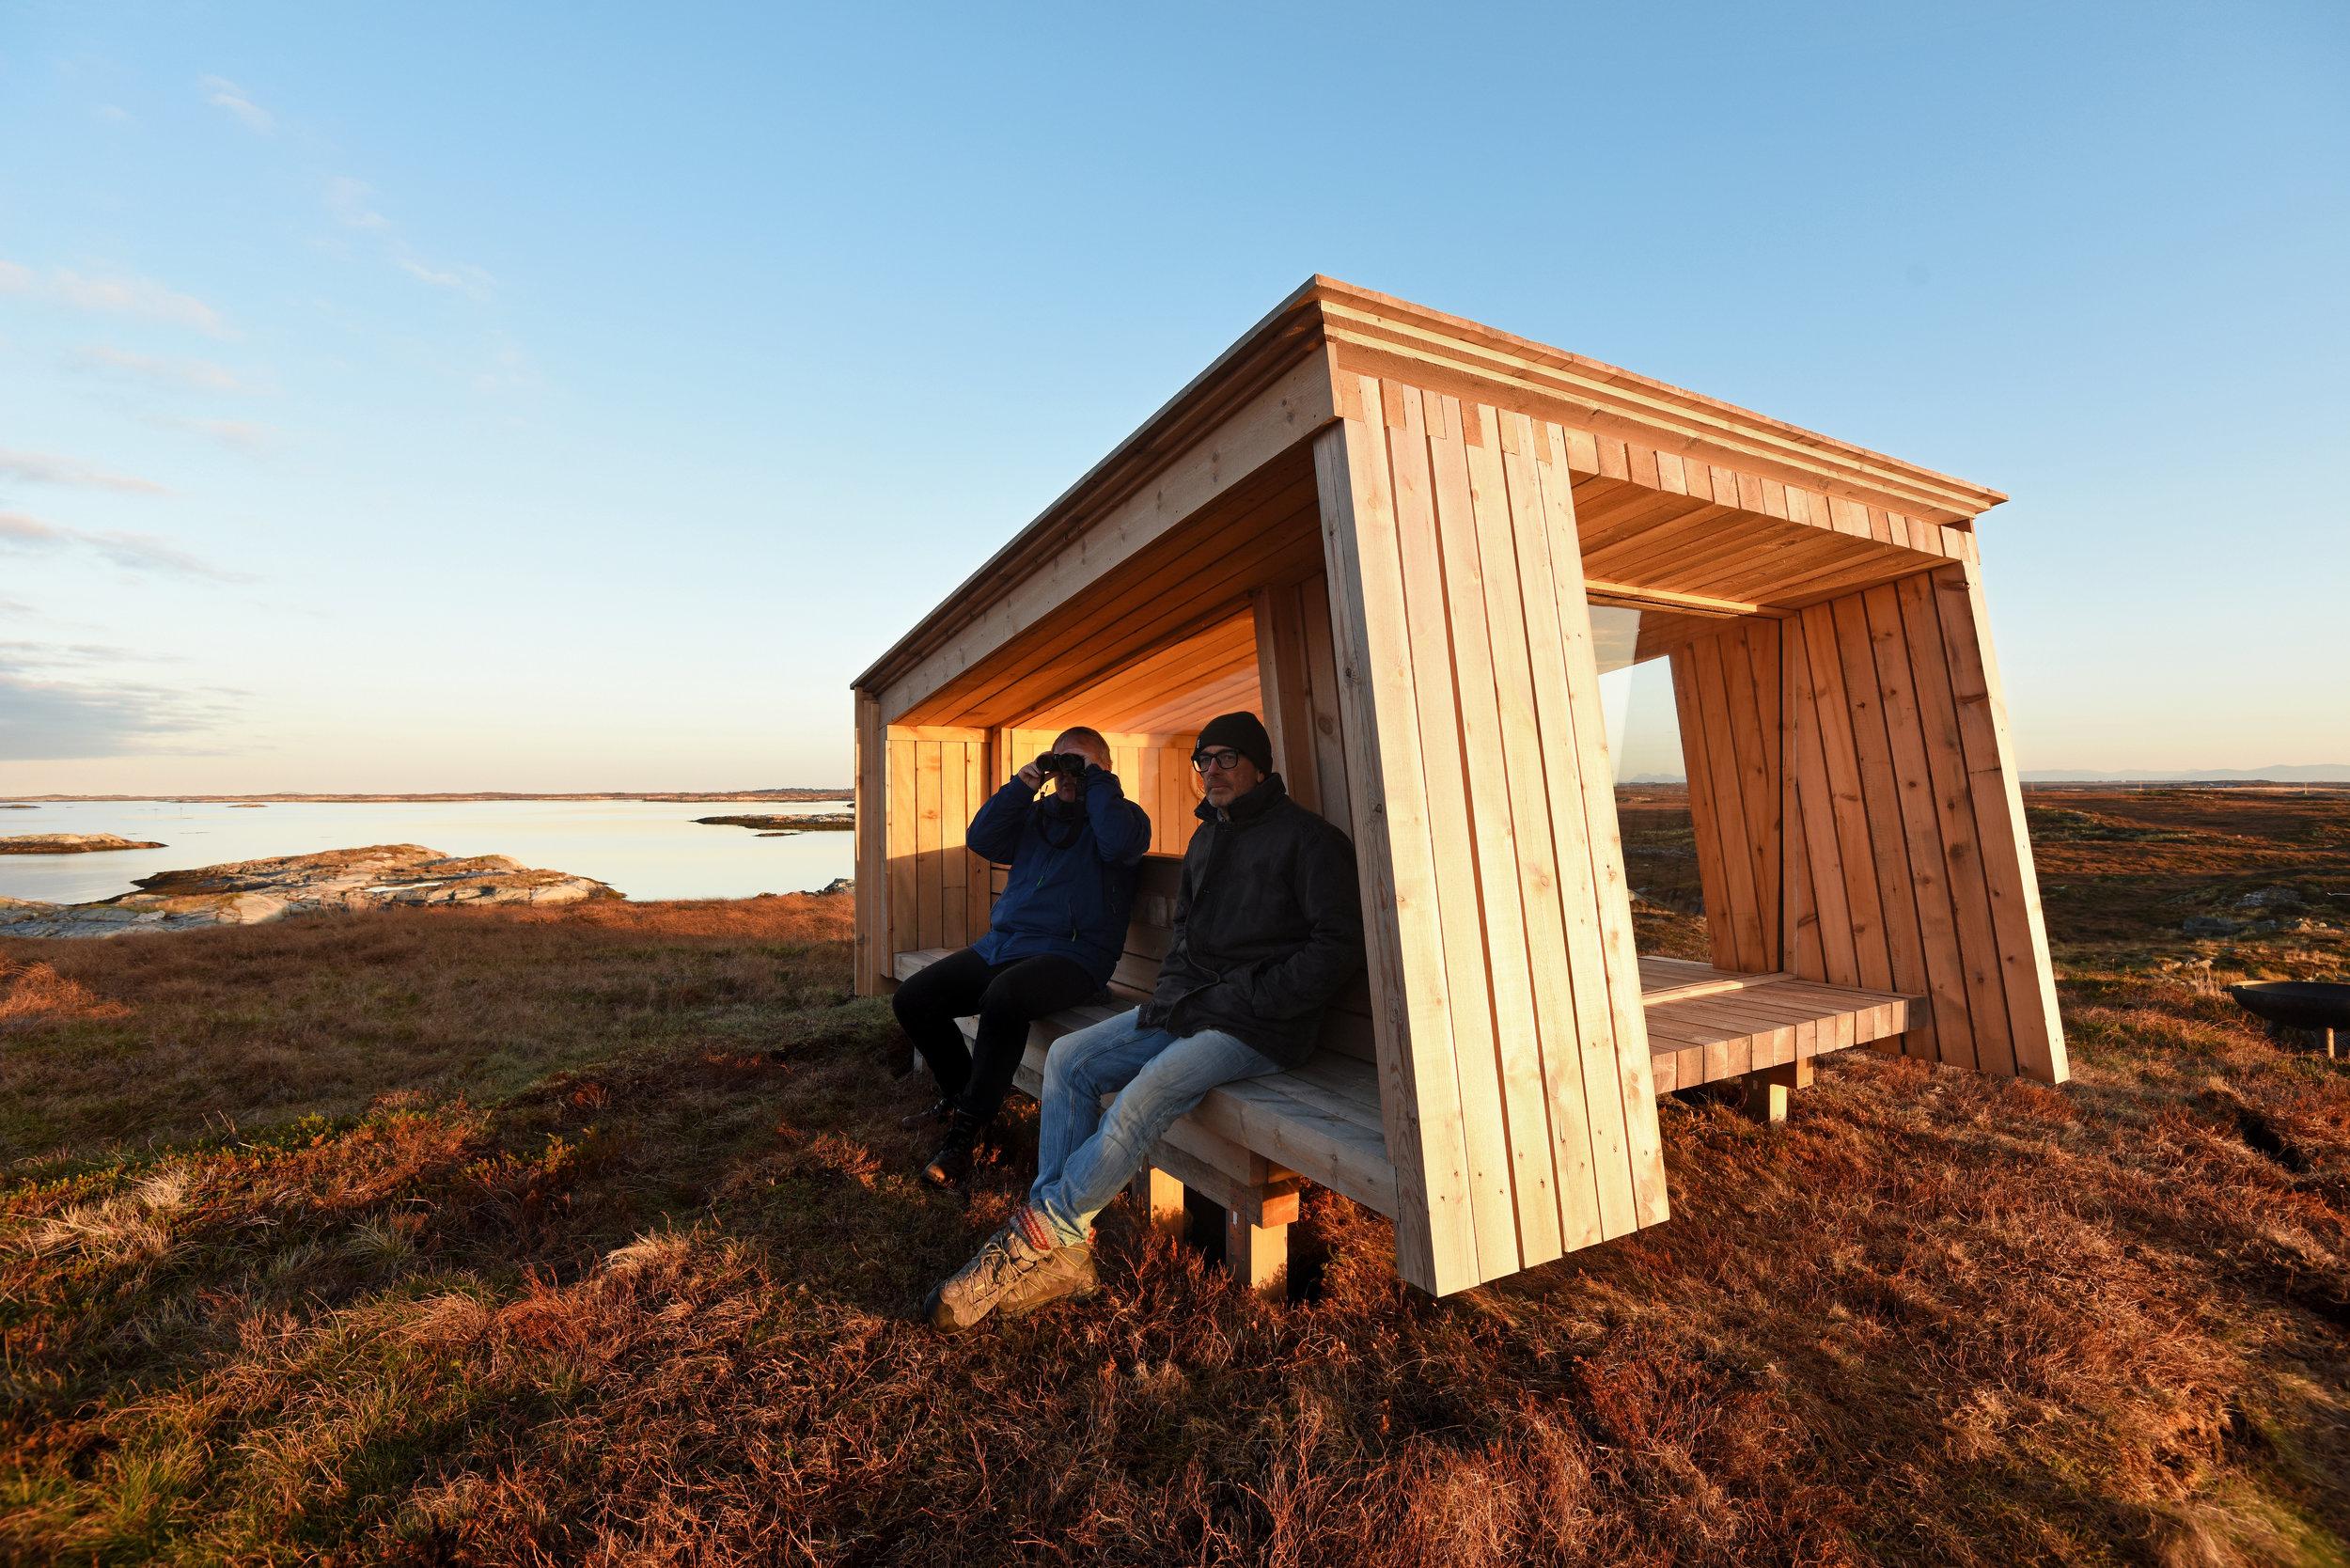 Smøla wind shelter Fugleøya view November 2014 © Tormod Amundsen Biotope.jpg